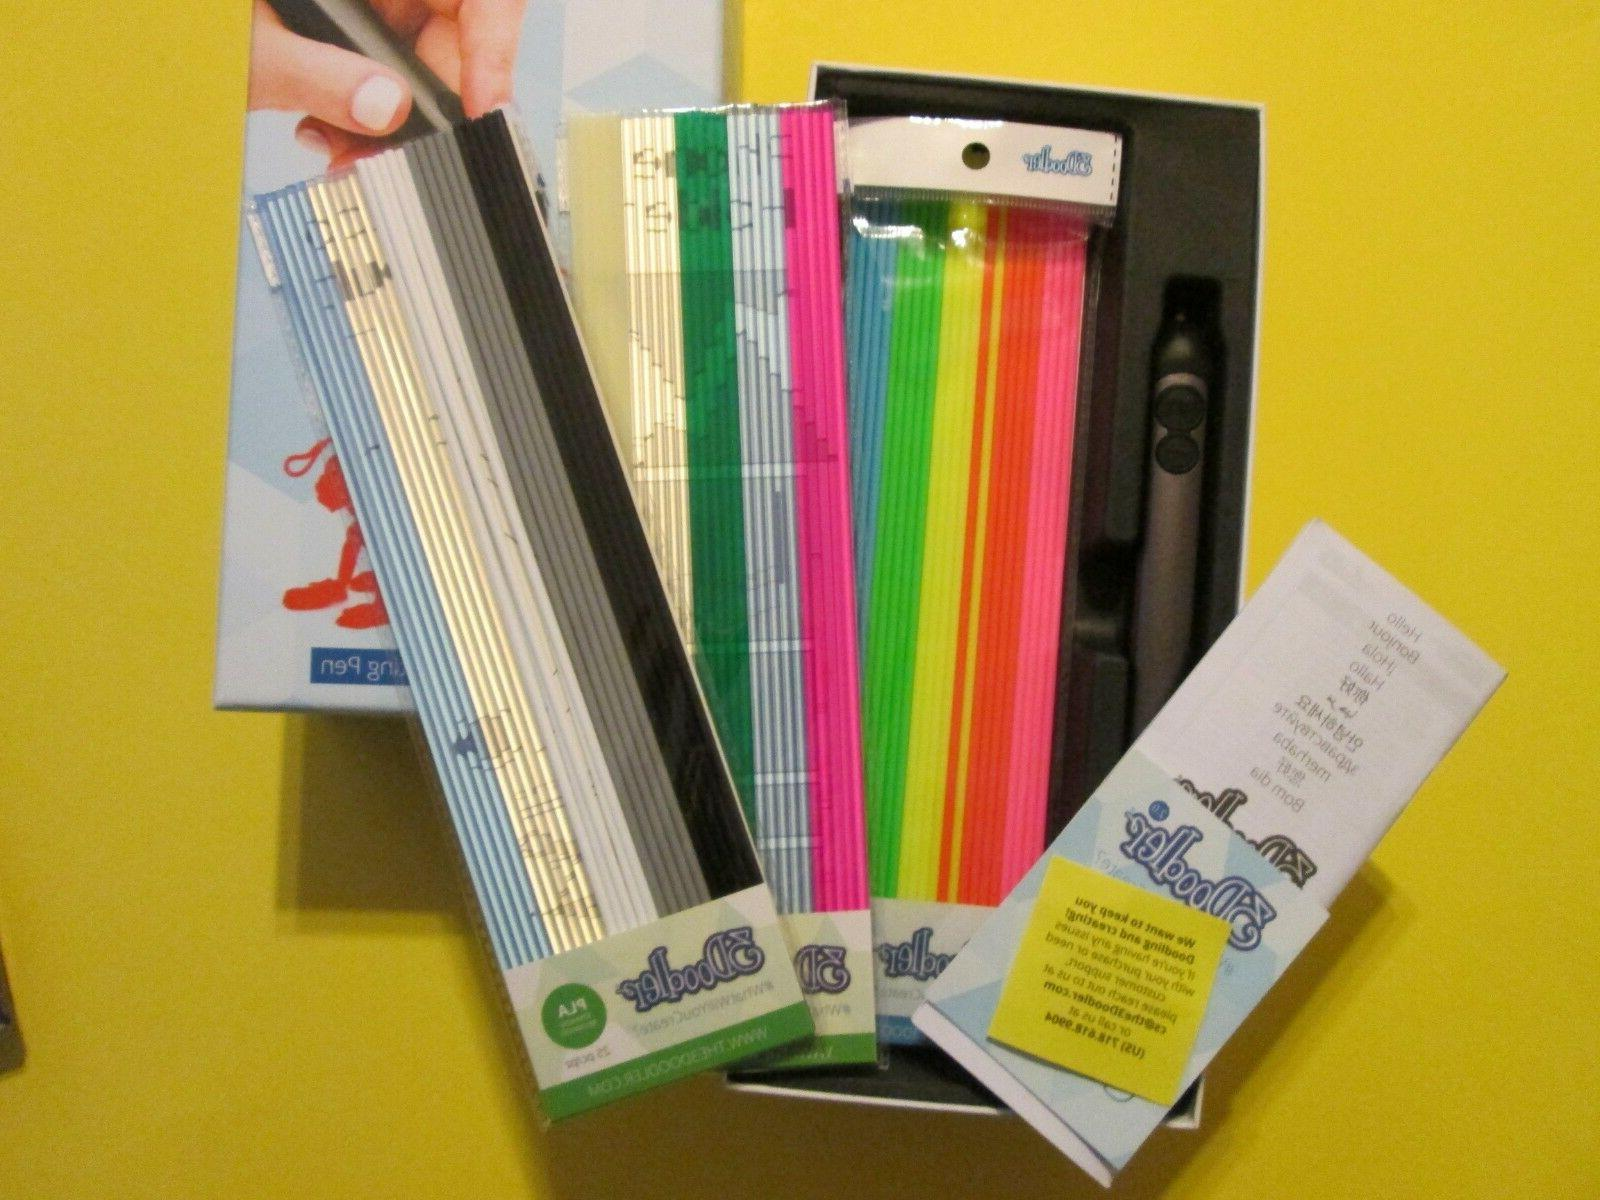 2 0 handheld 3d print pen